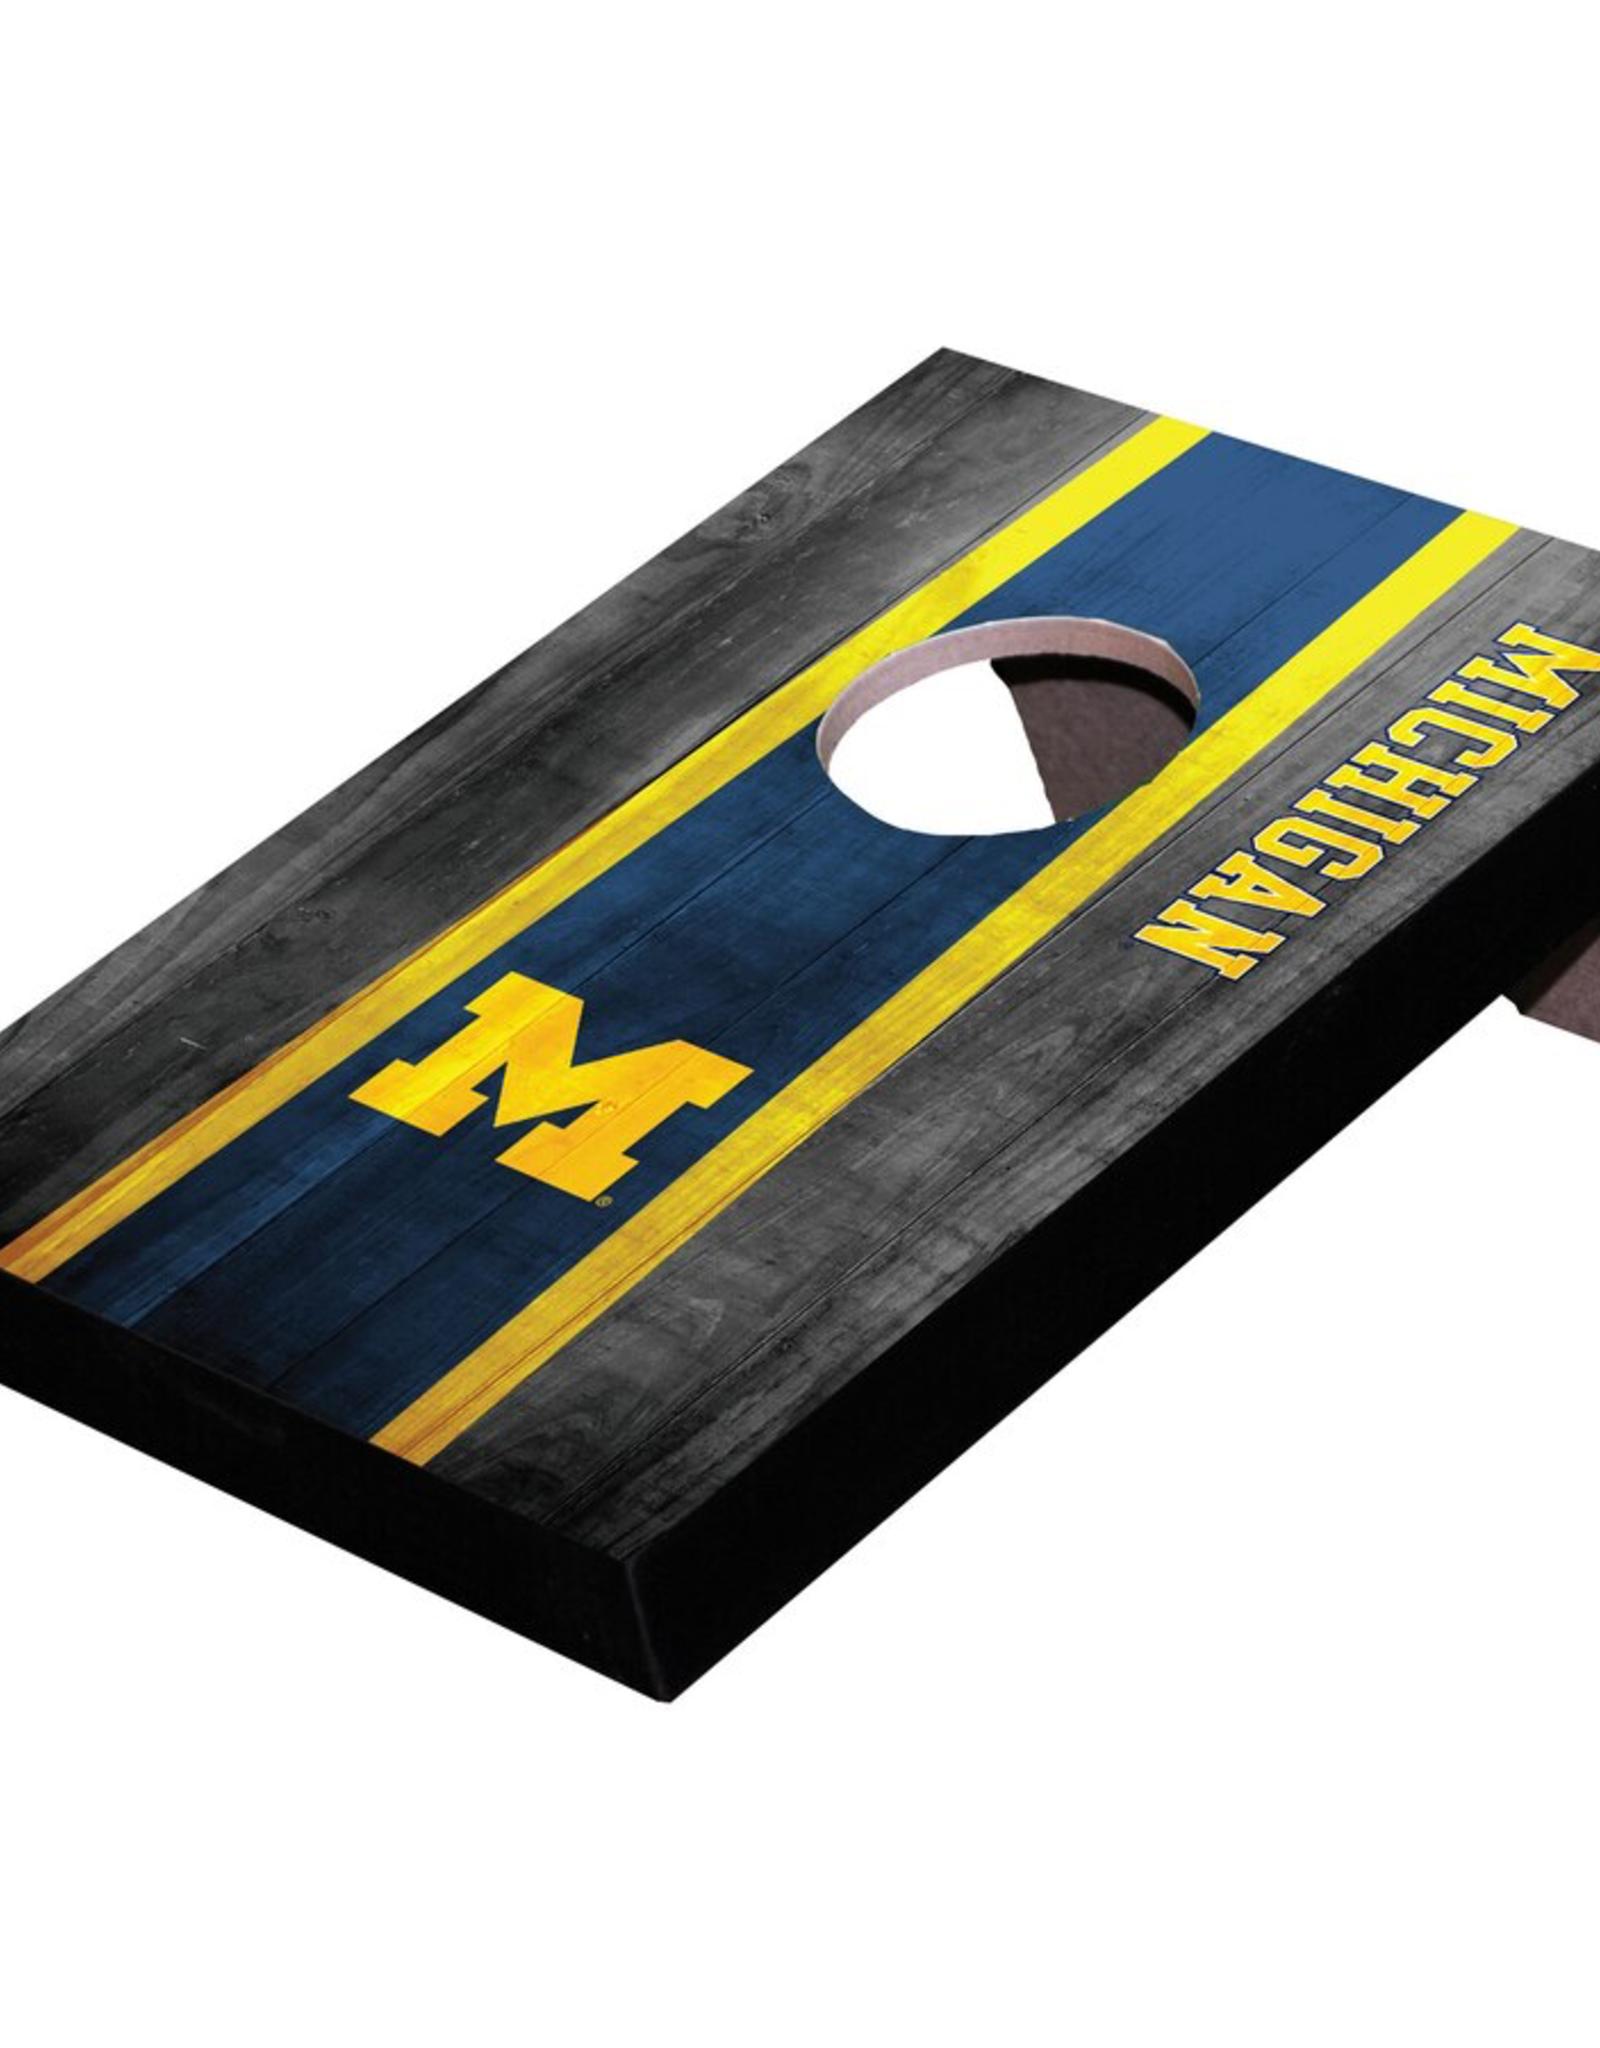 WILD SPORTS University of Michigan Wolverines Mini Tabletop Cornhole Board